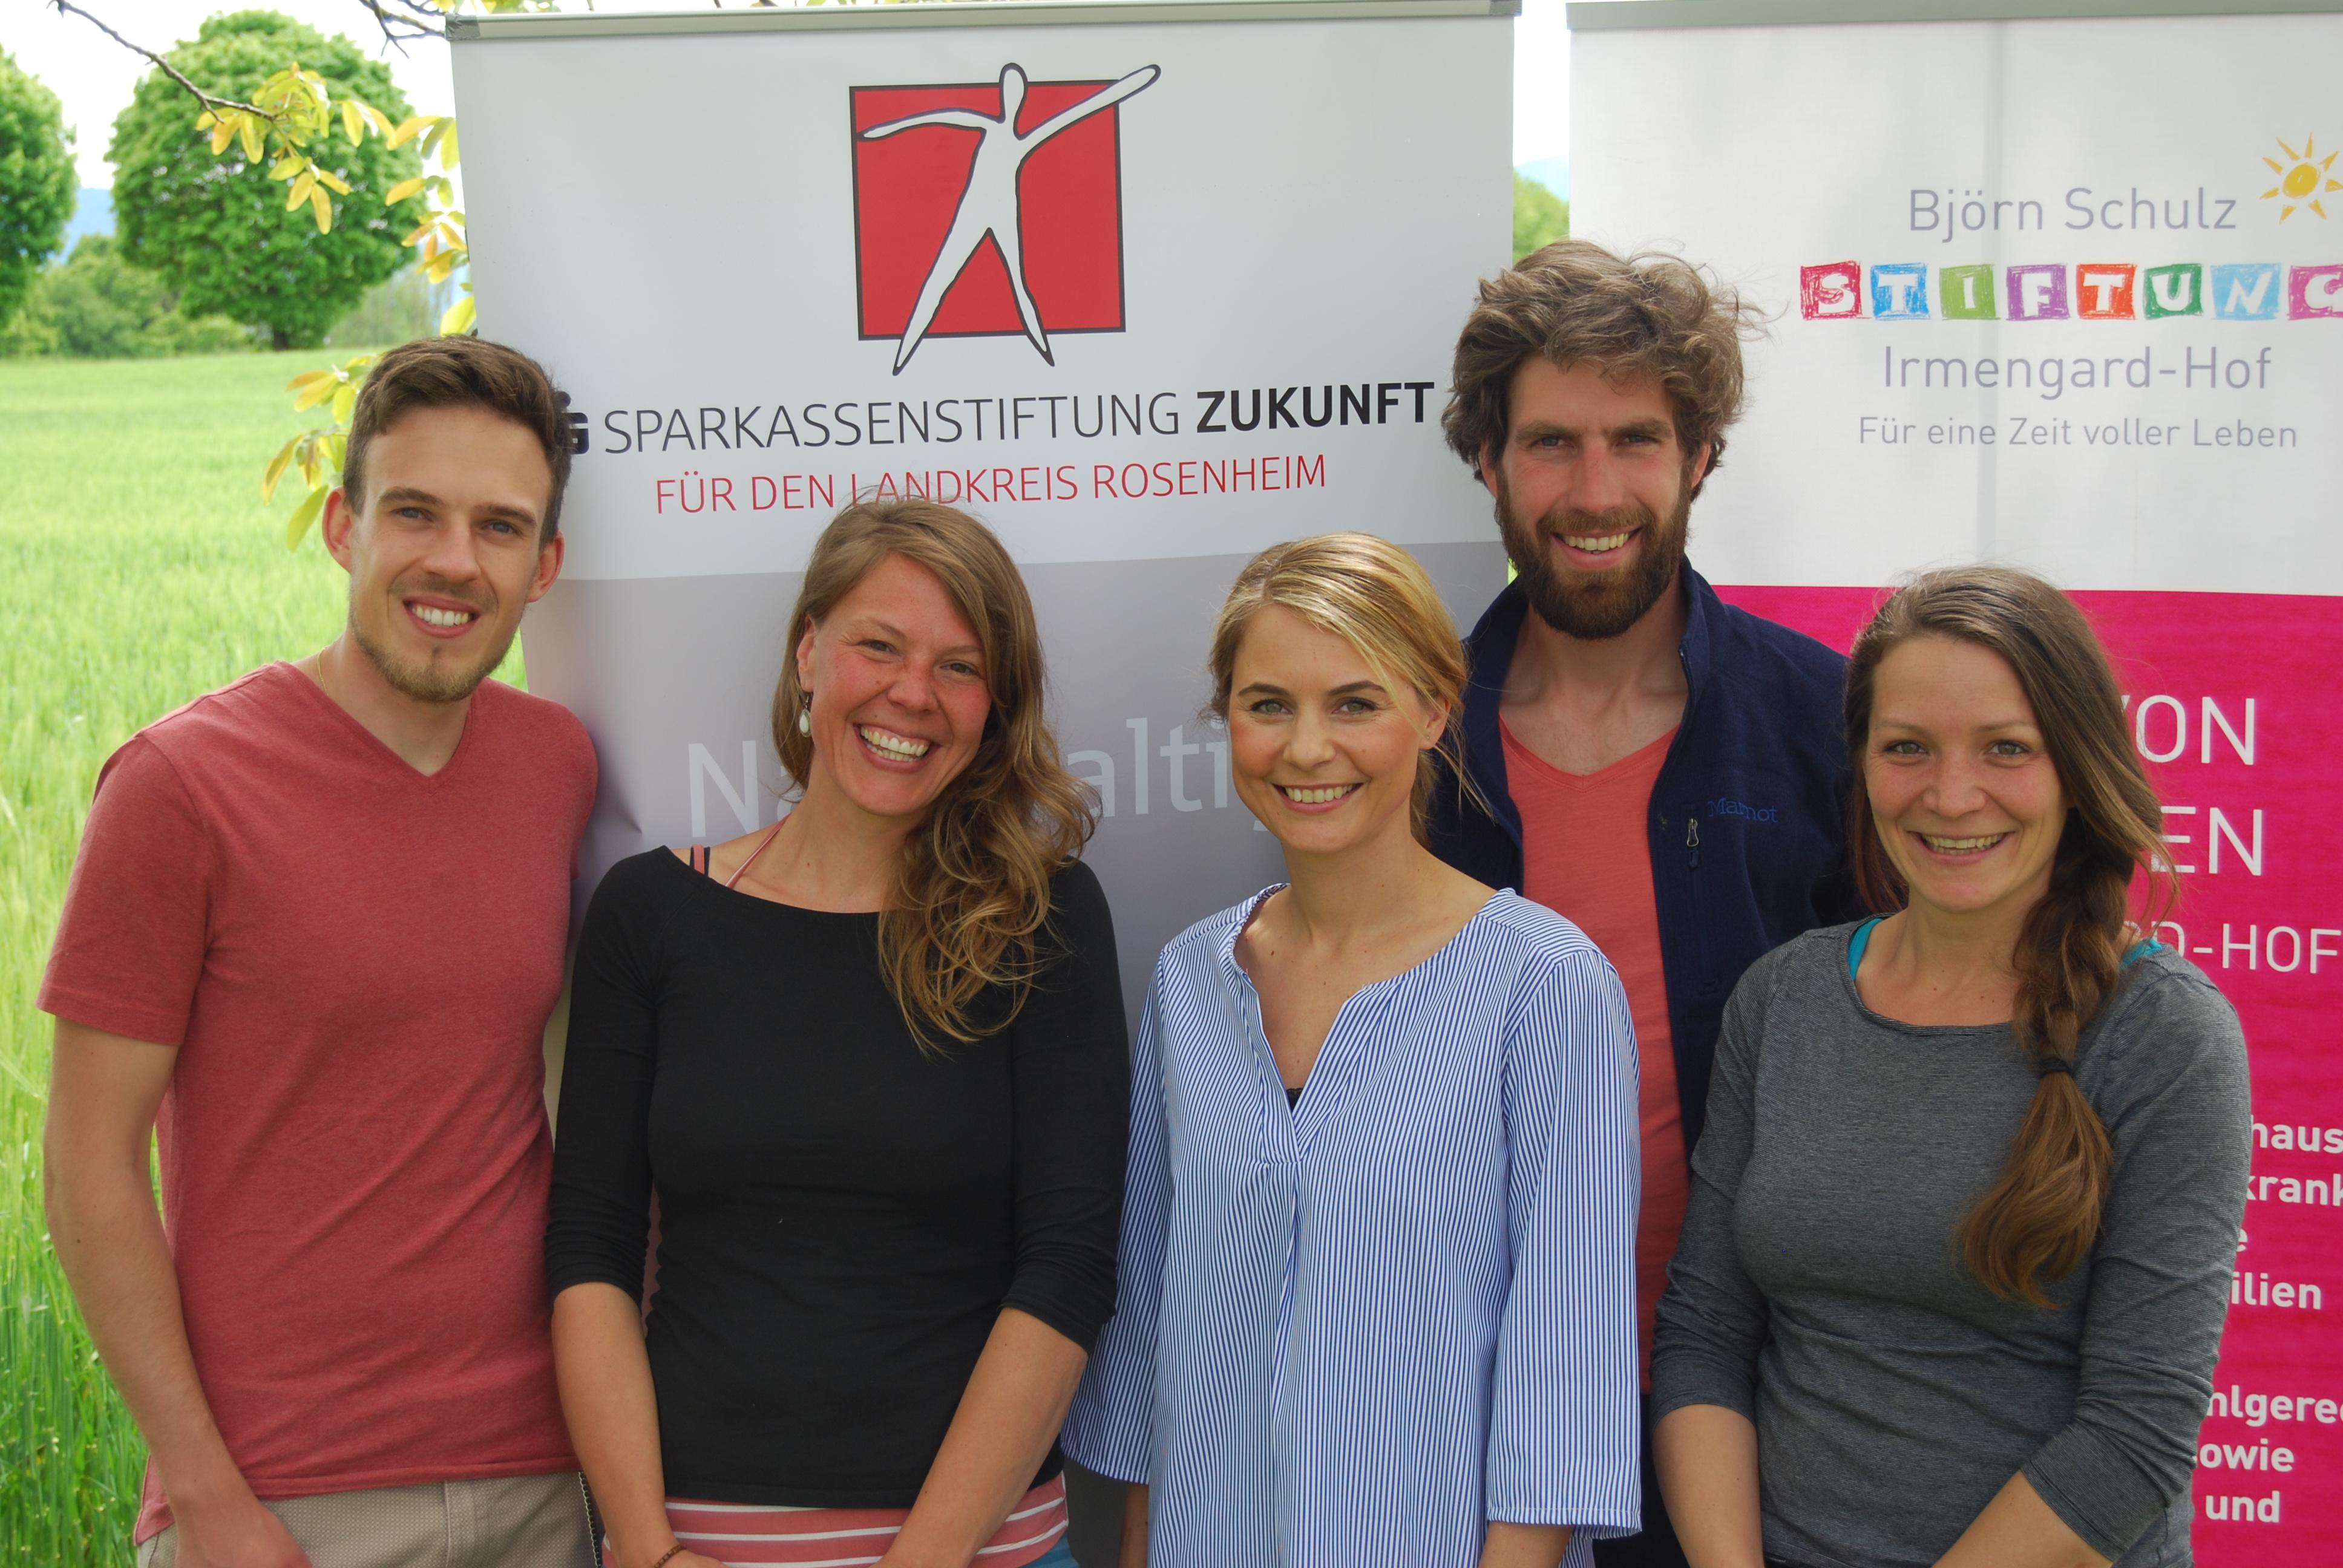 Franziska Bürger, Alexa Hubert und Linda Schlesinger (v.re.) mit zwei Honorarkräften.